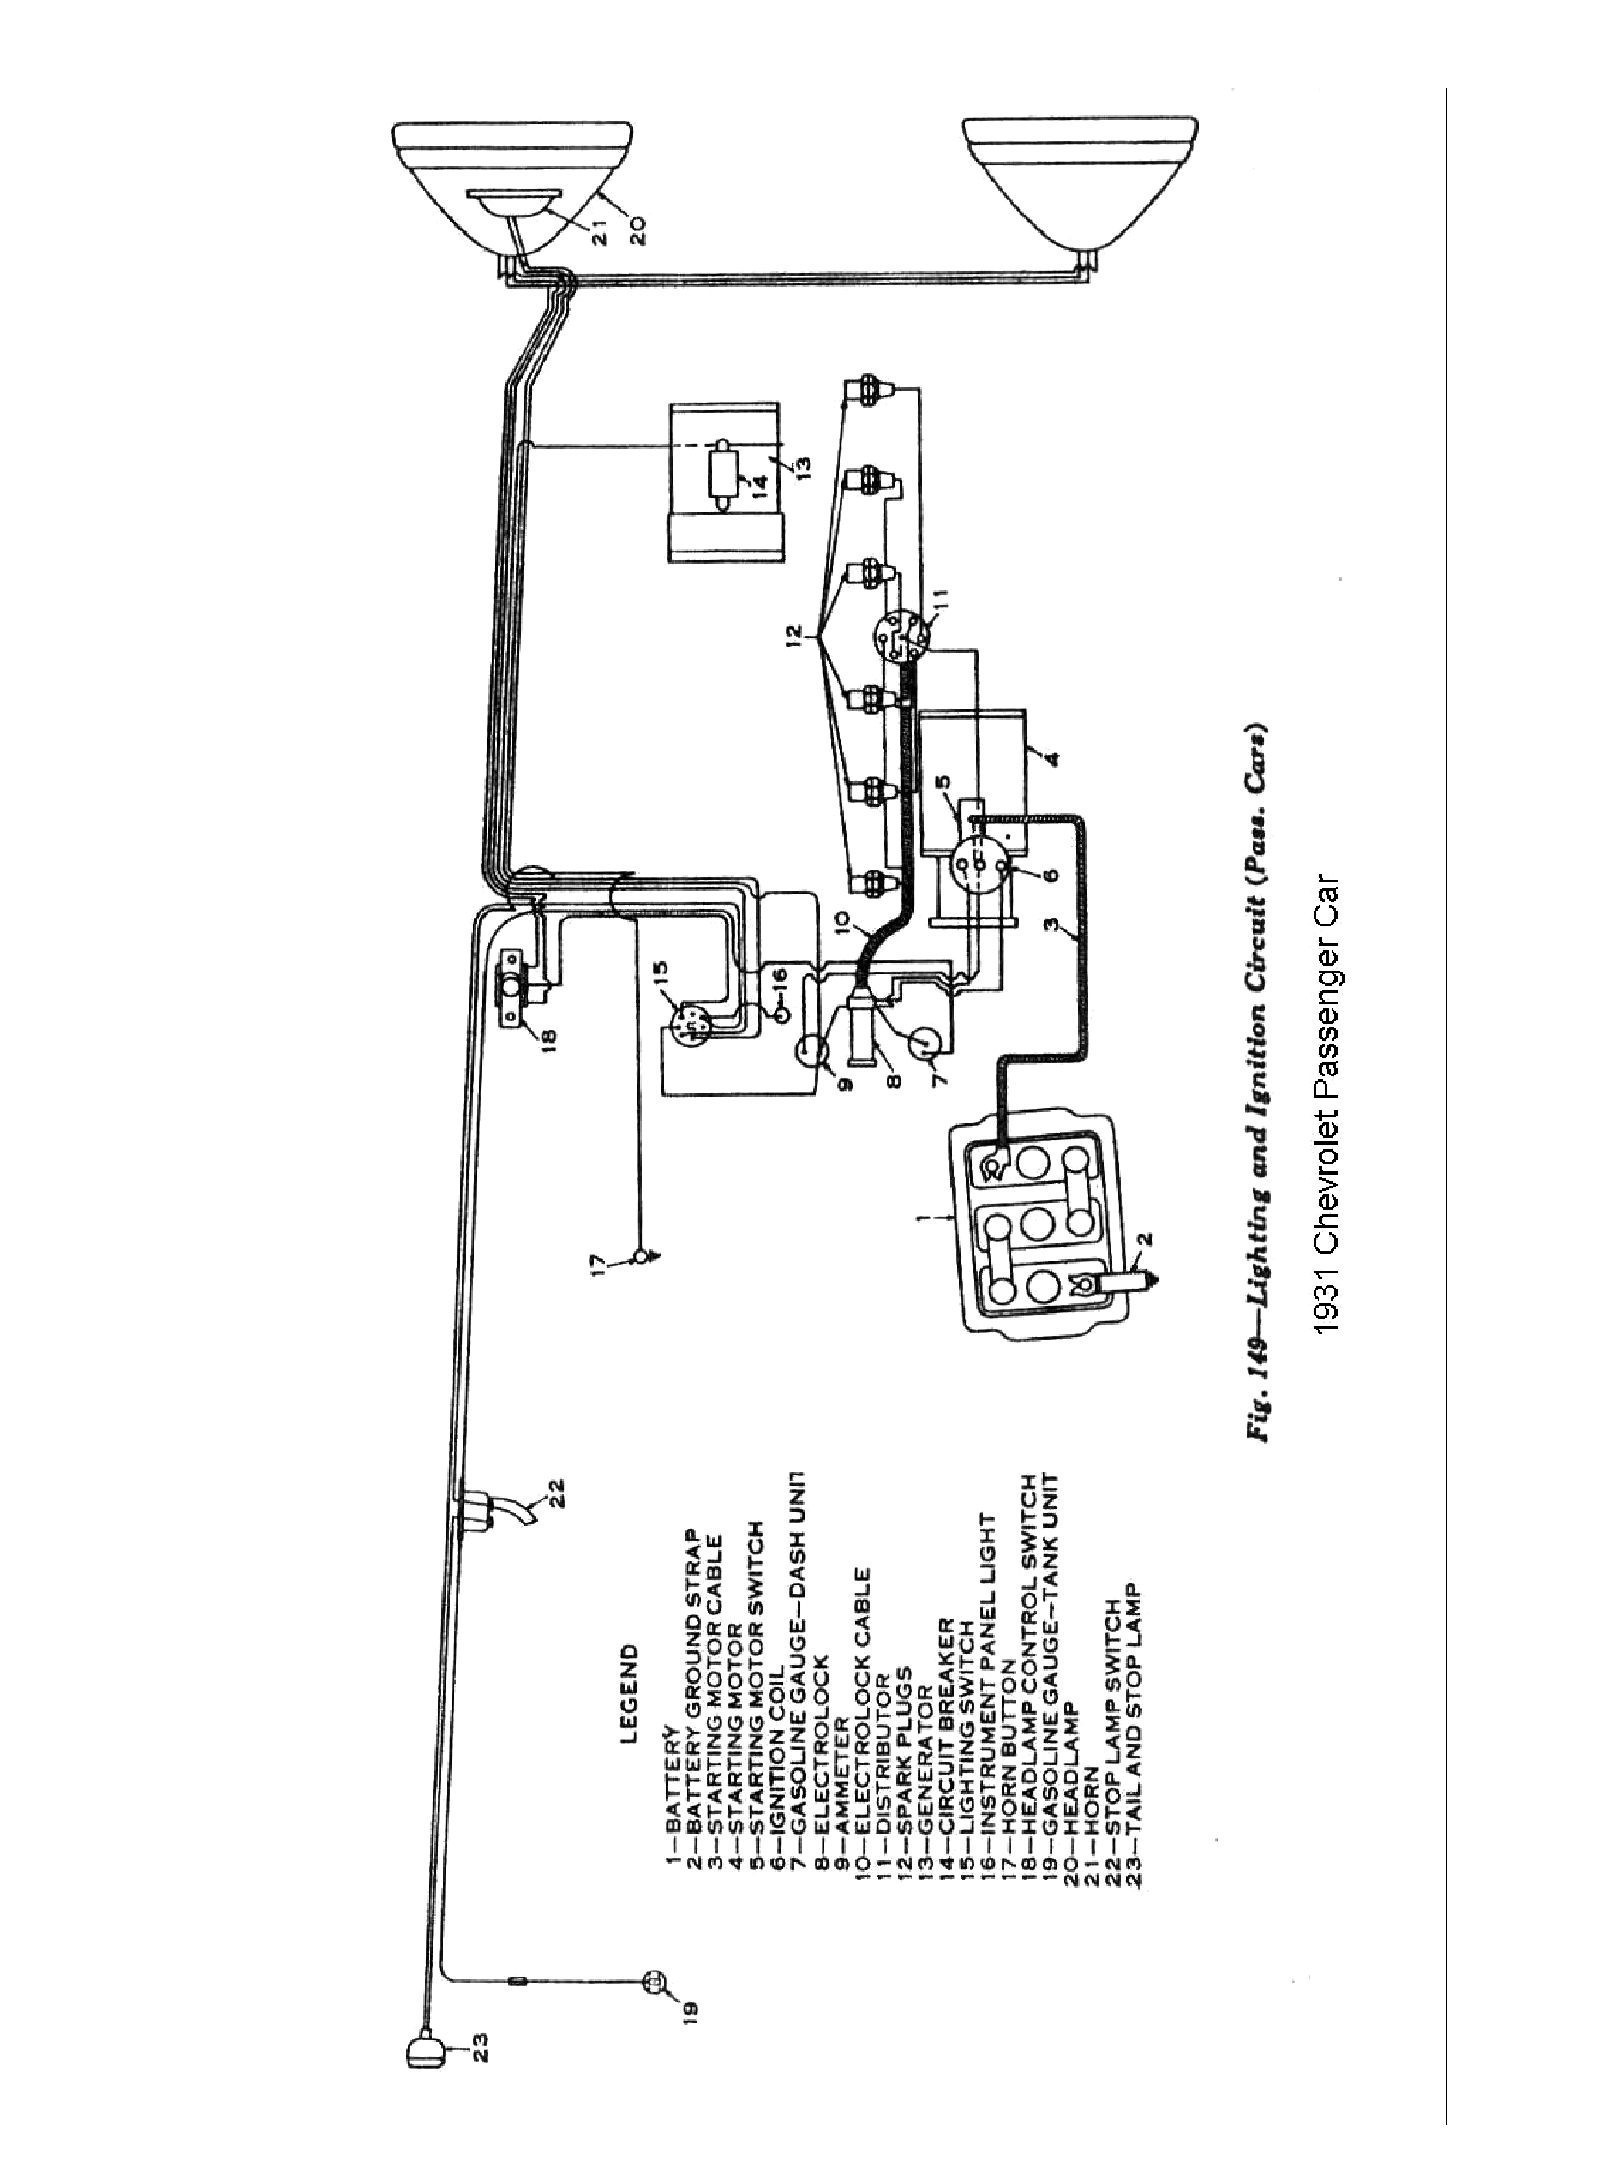 Club Car Wiring Diagram Gas Best How to Wire A Garage Diagram Beautiful Wiring Diagram